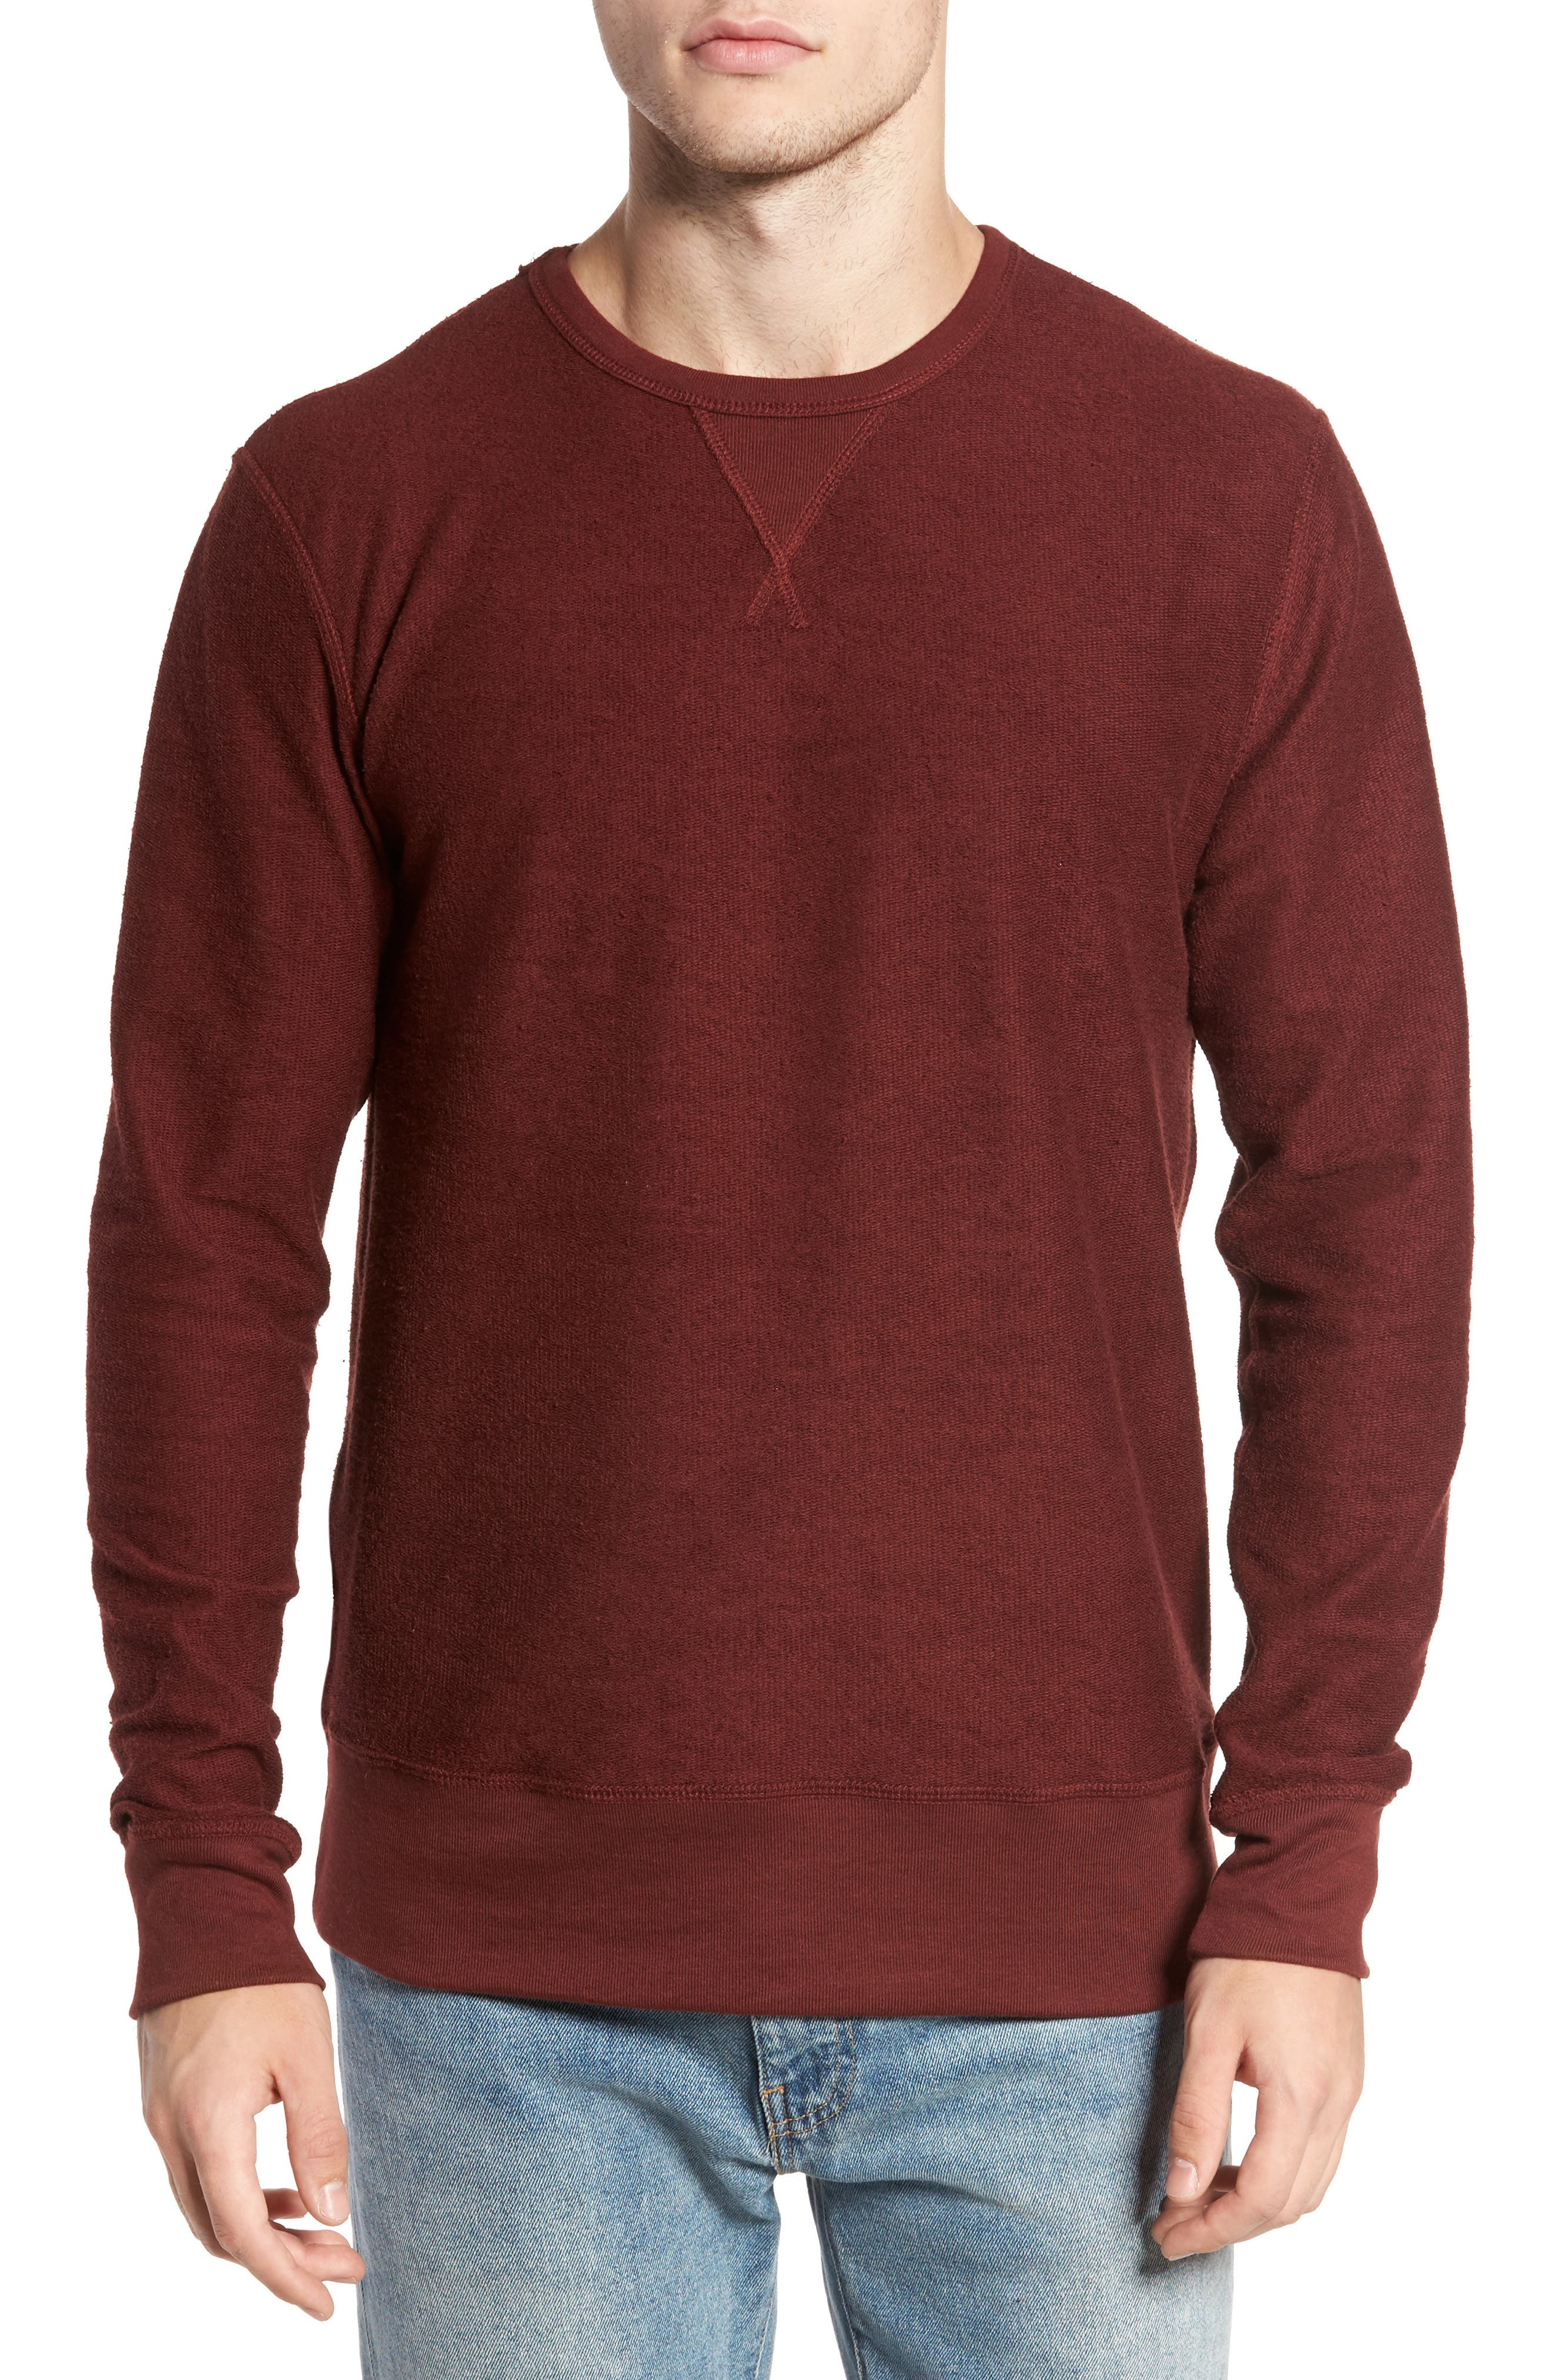 B-Side Reversible Crewneck Sweatshirt,                             Main thumbnail 1, color,                             Maroon